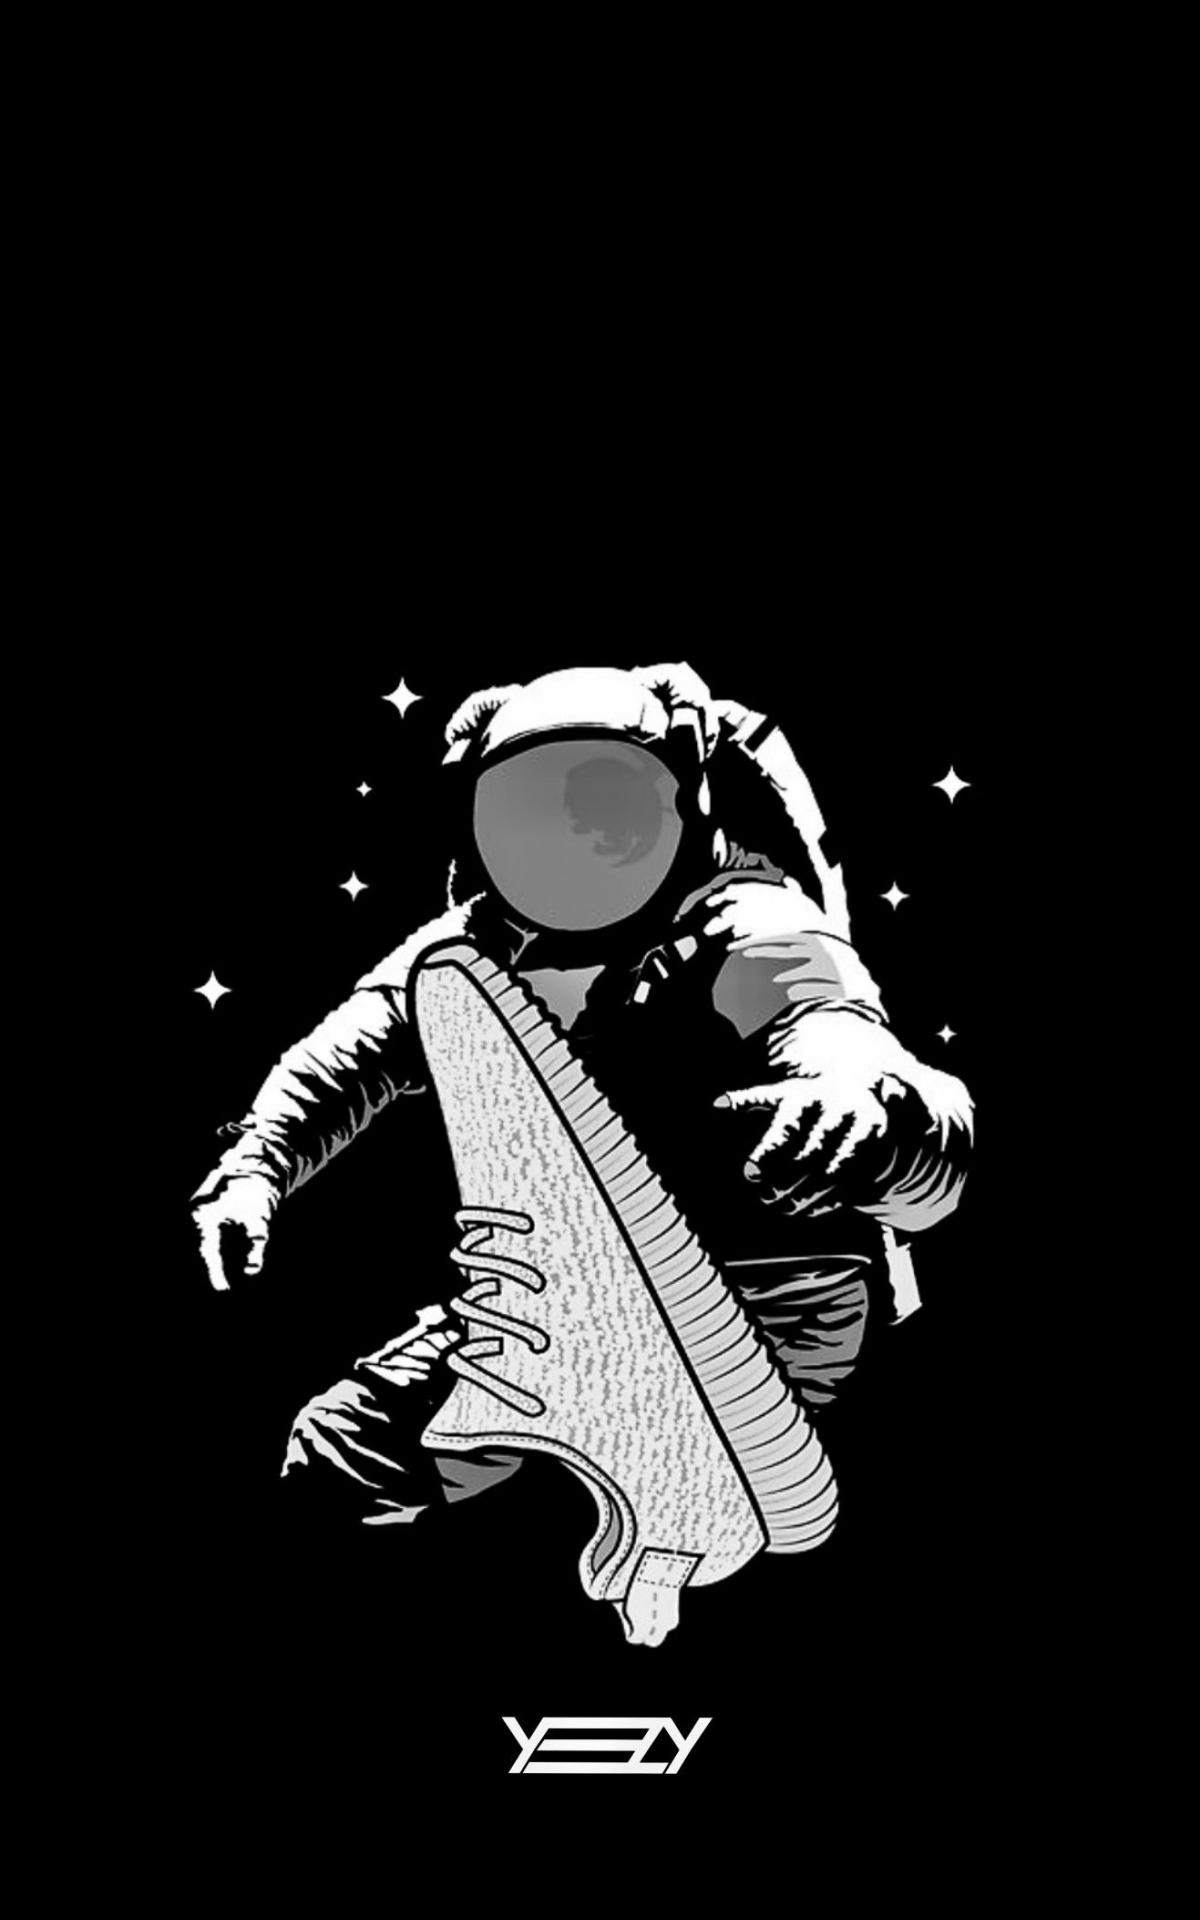 Free Download Yeezy Moonrock Dope Hypebeast Wallpaper Dope Wallpapers Bape 1317x2662 For Your Desktop Mobile Tablet Explore 42 Hypebeast Bape Wallpaper Hypebeast Bape Wallpaper Bape Shark Wallpaper Bape Camo Wallpaper